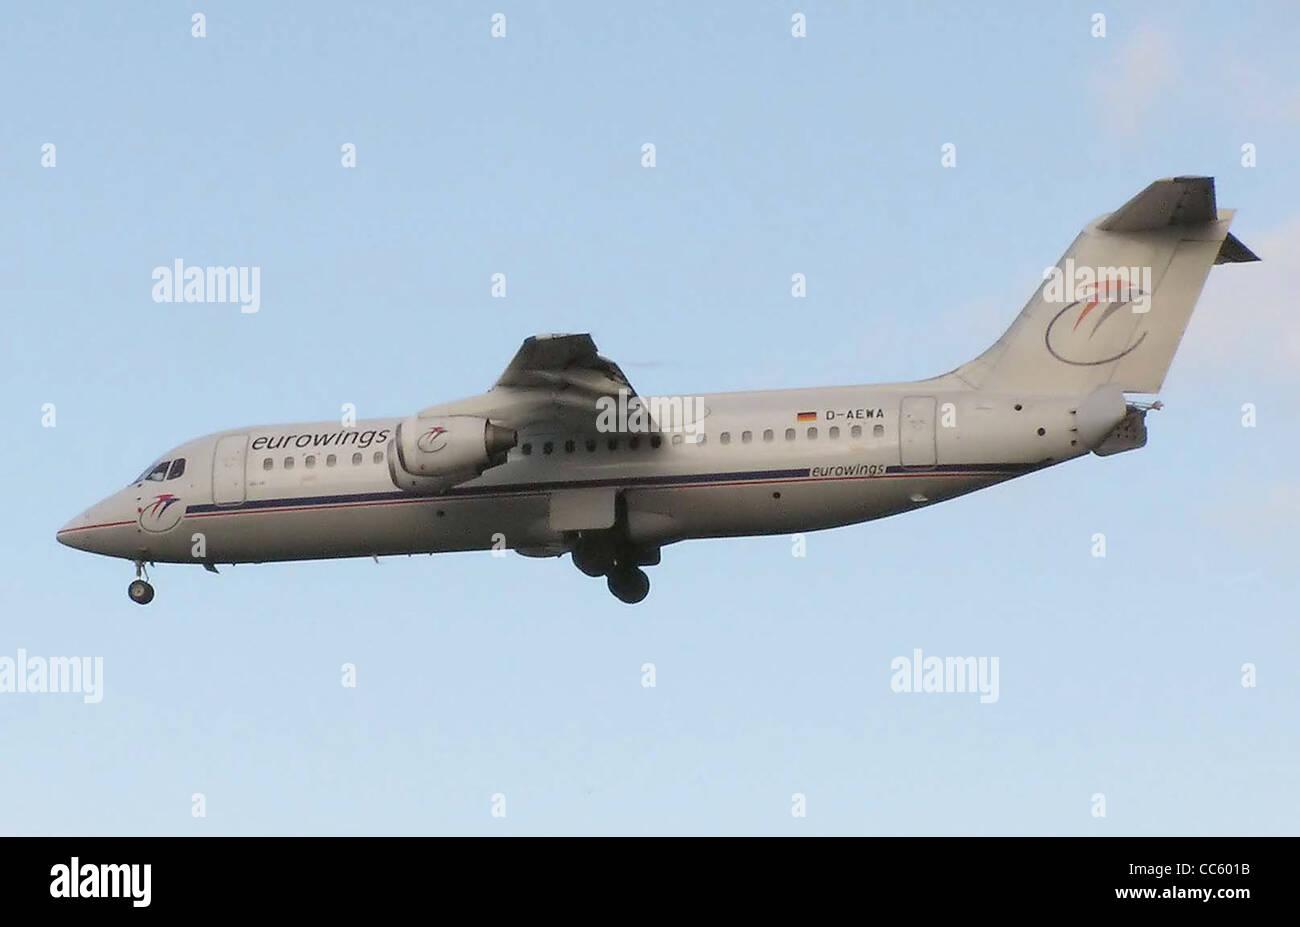 Eurowings British Aerospace 146-300 (with German registration D-AEWA) landing at London Heathrow Airport. - Stock Image